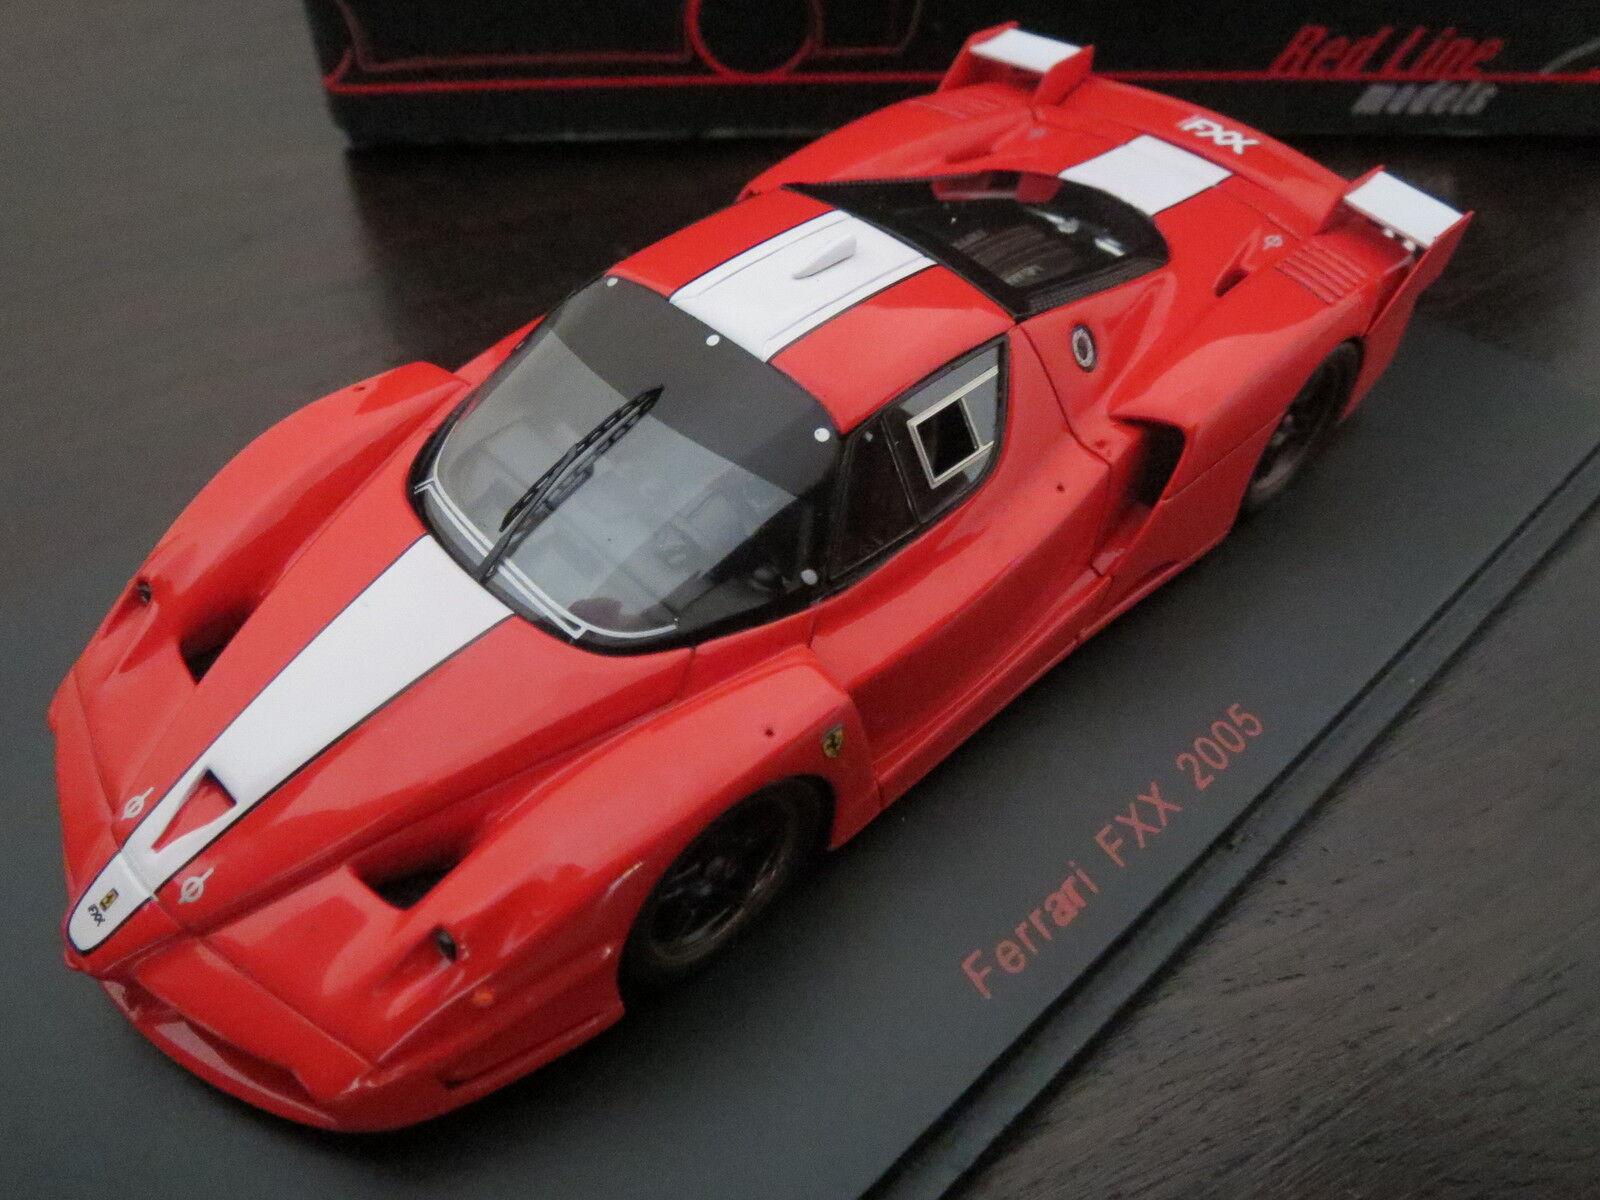 RARITÄT  rotLine models Ferrari FXX 2005, rot, 1 43, TOP  | Economy